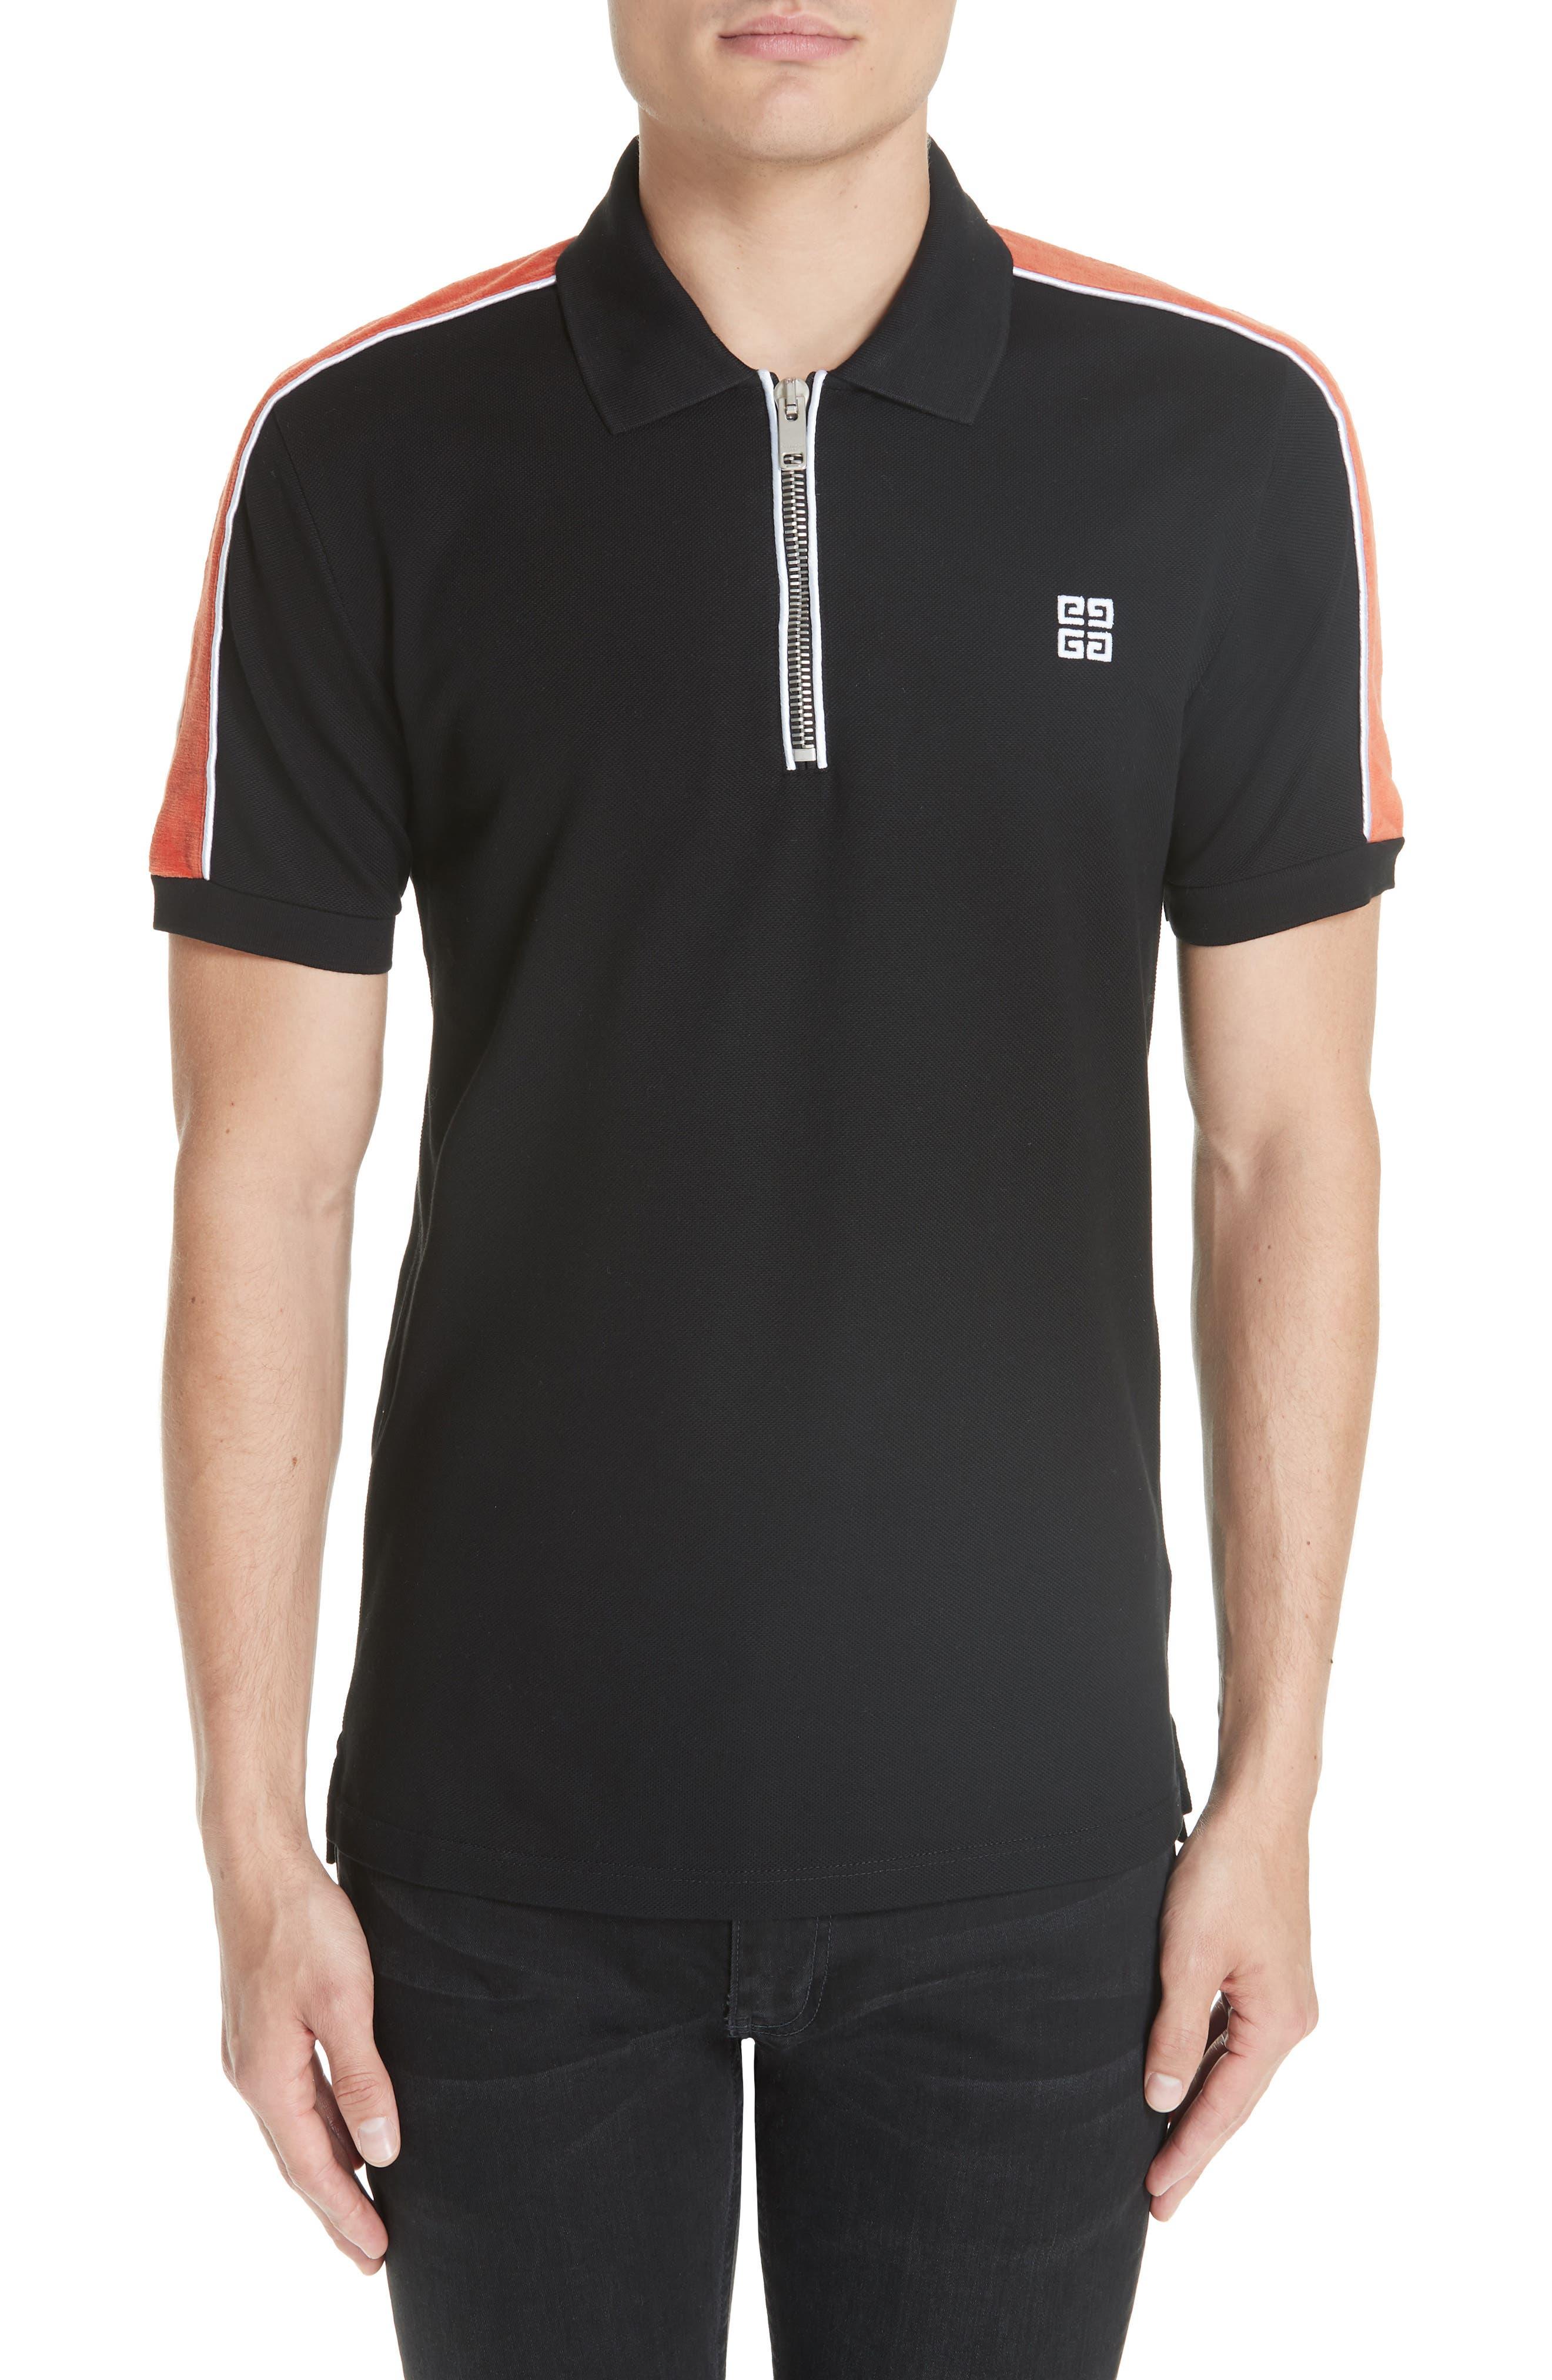 ba3d4517b Polo Shirt Price In Canada